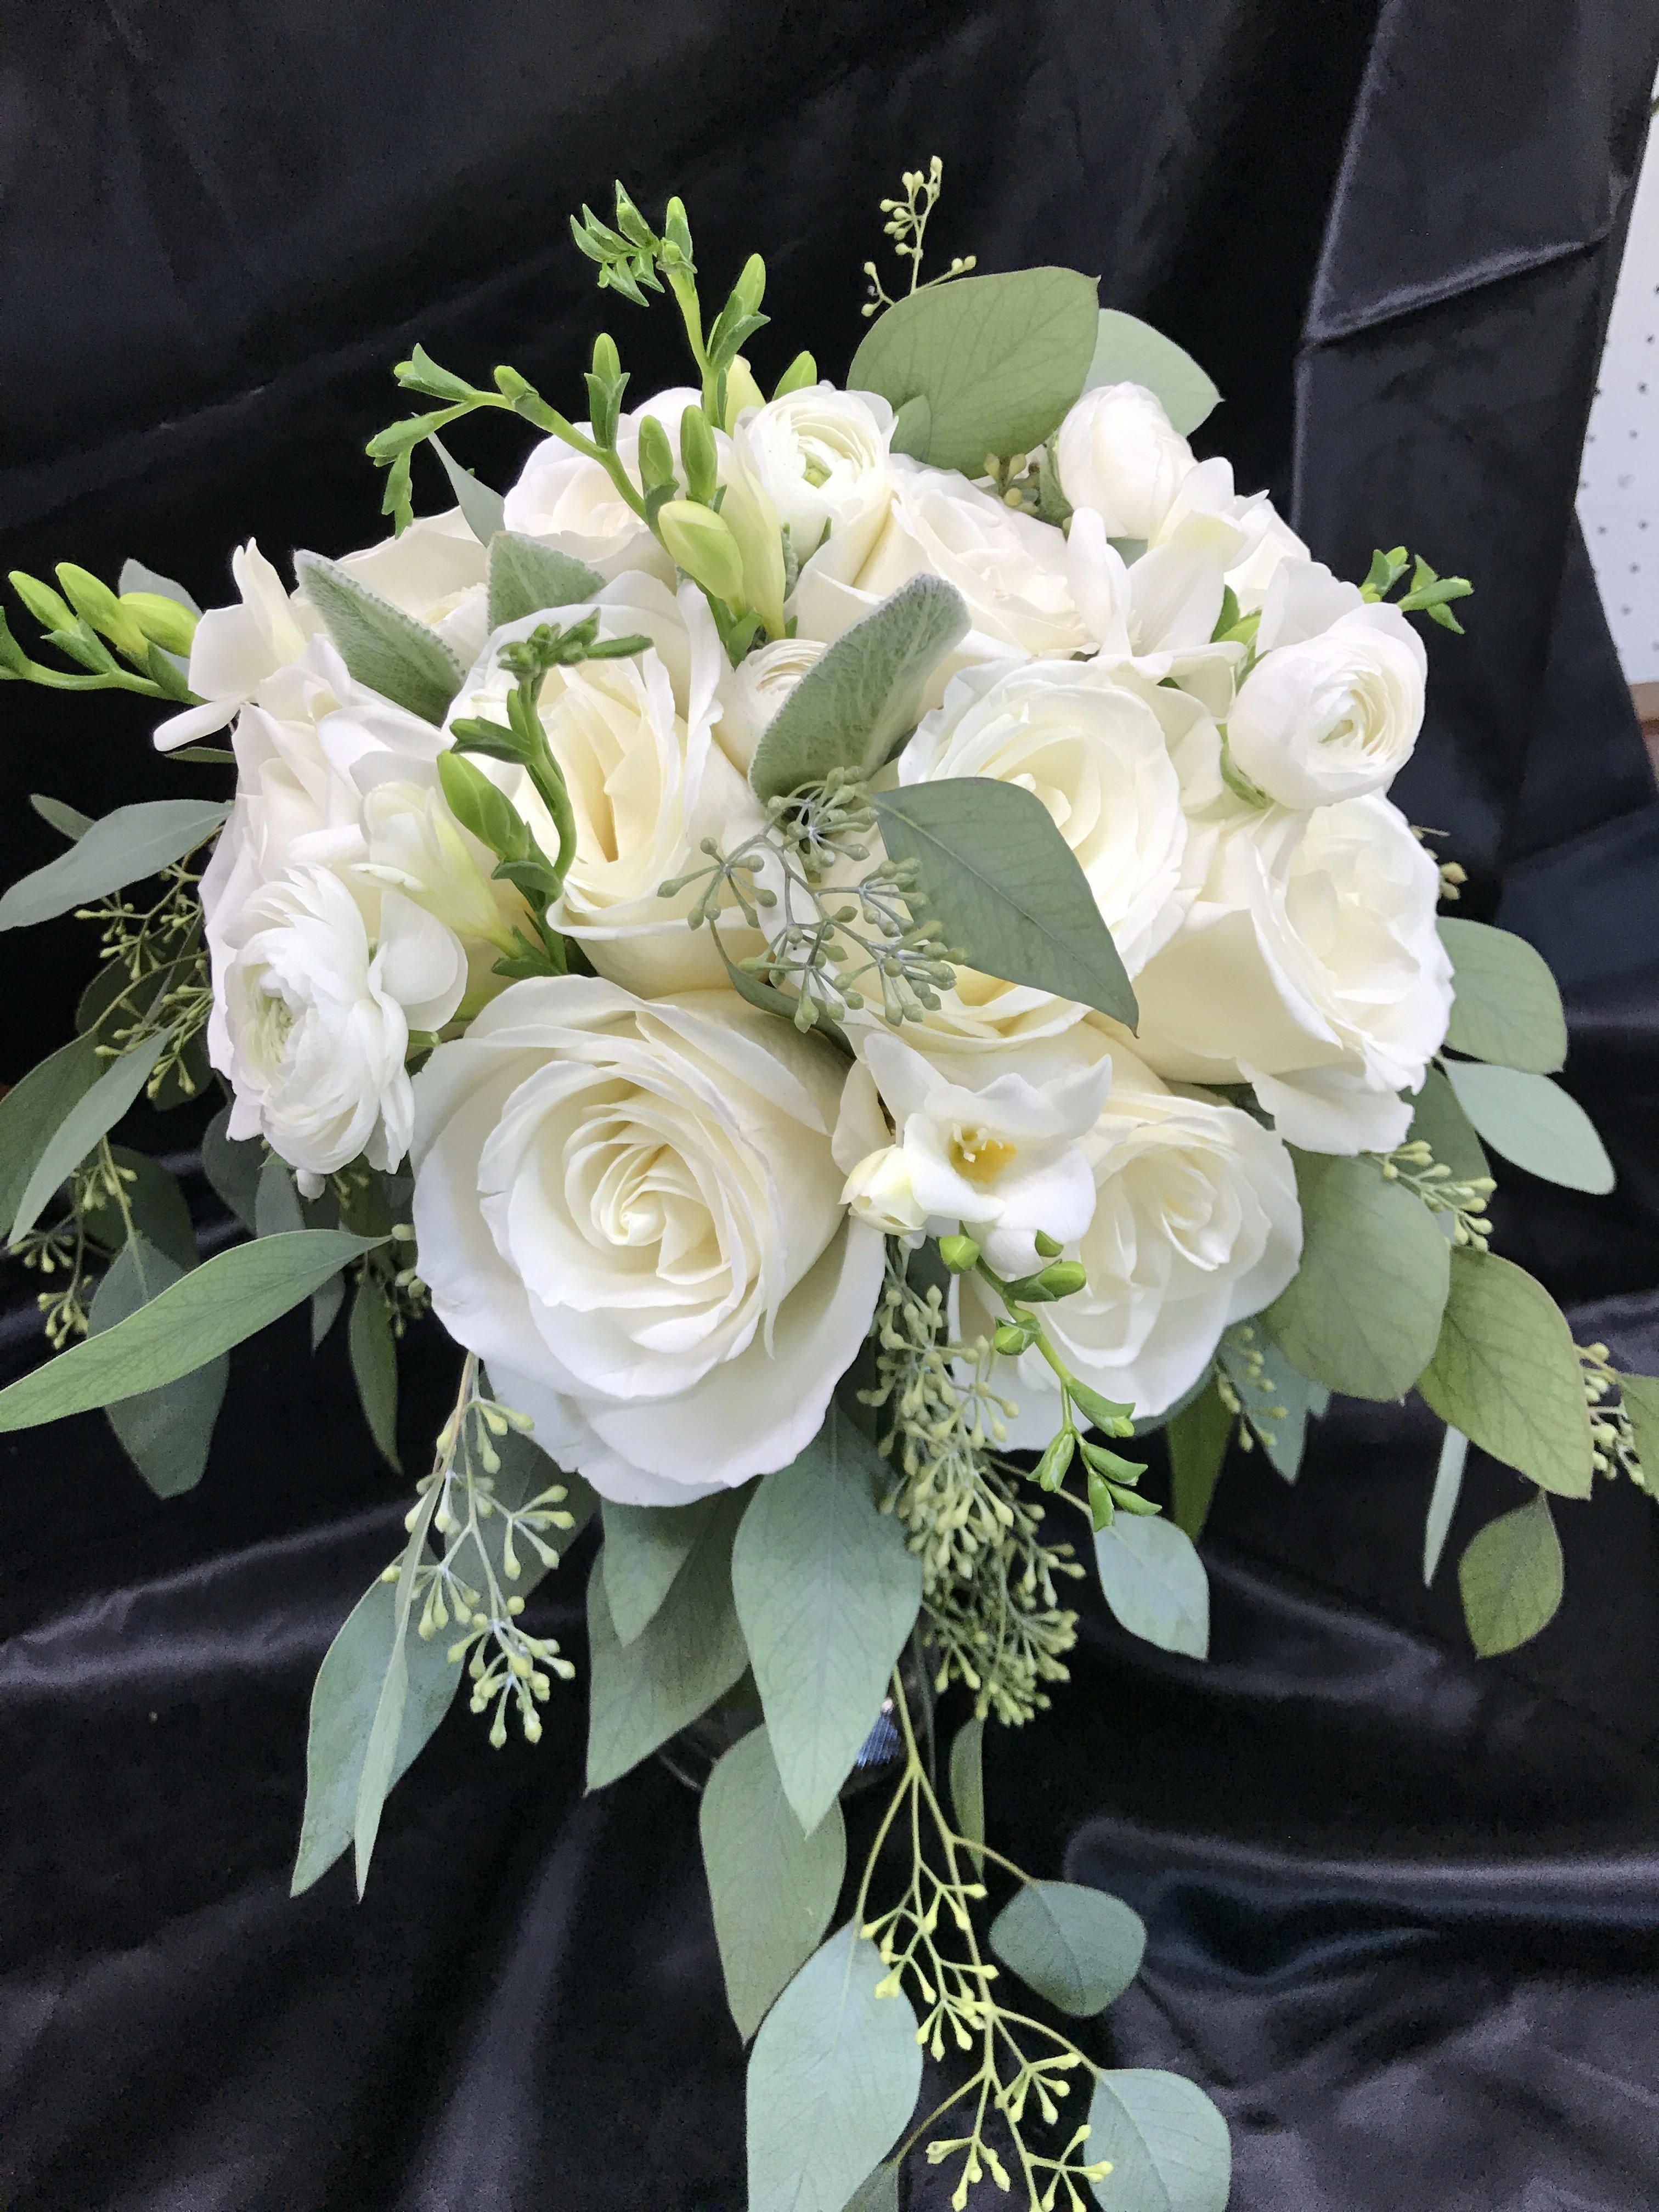 BloomNation: Send Flowers Same-Day